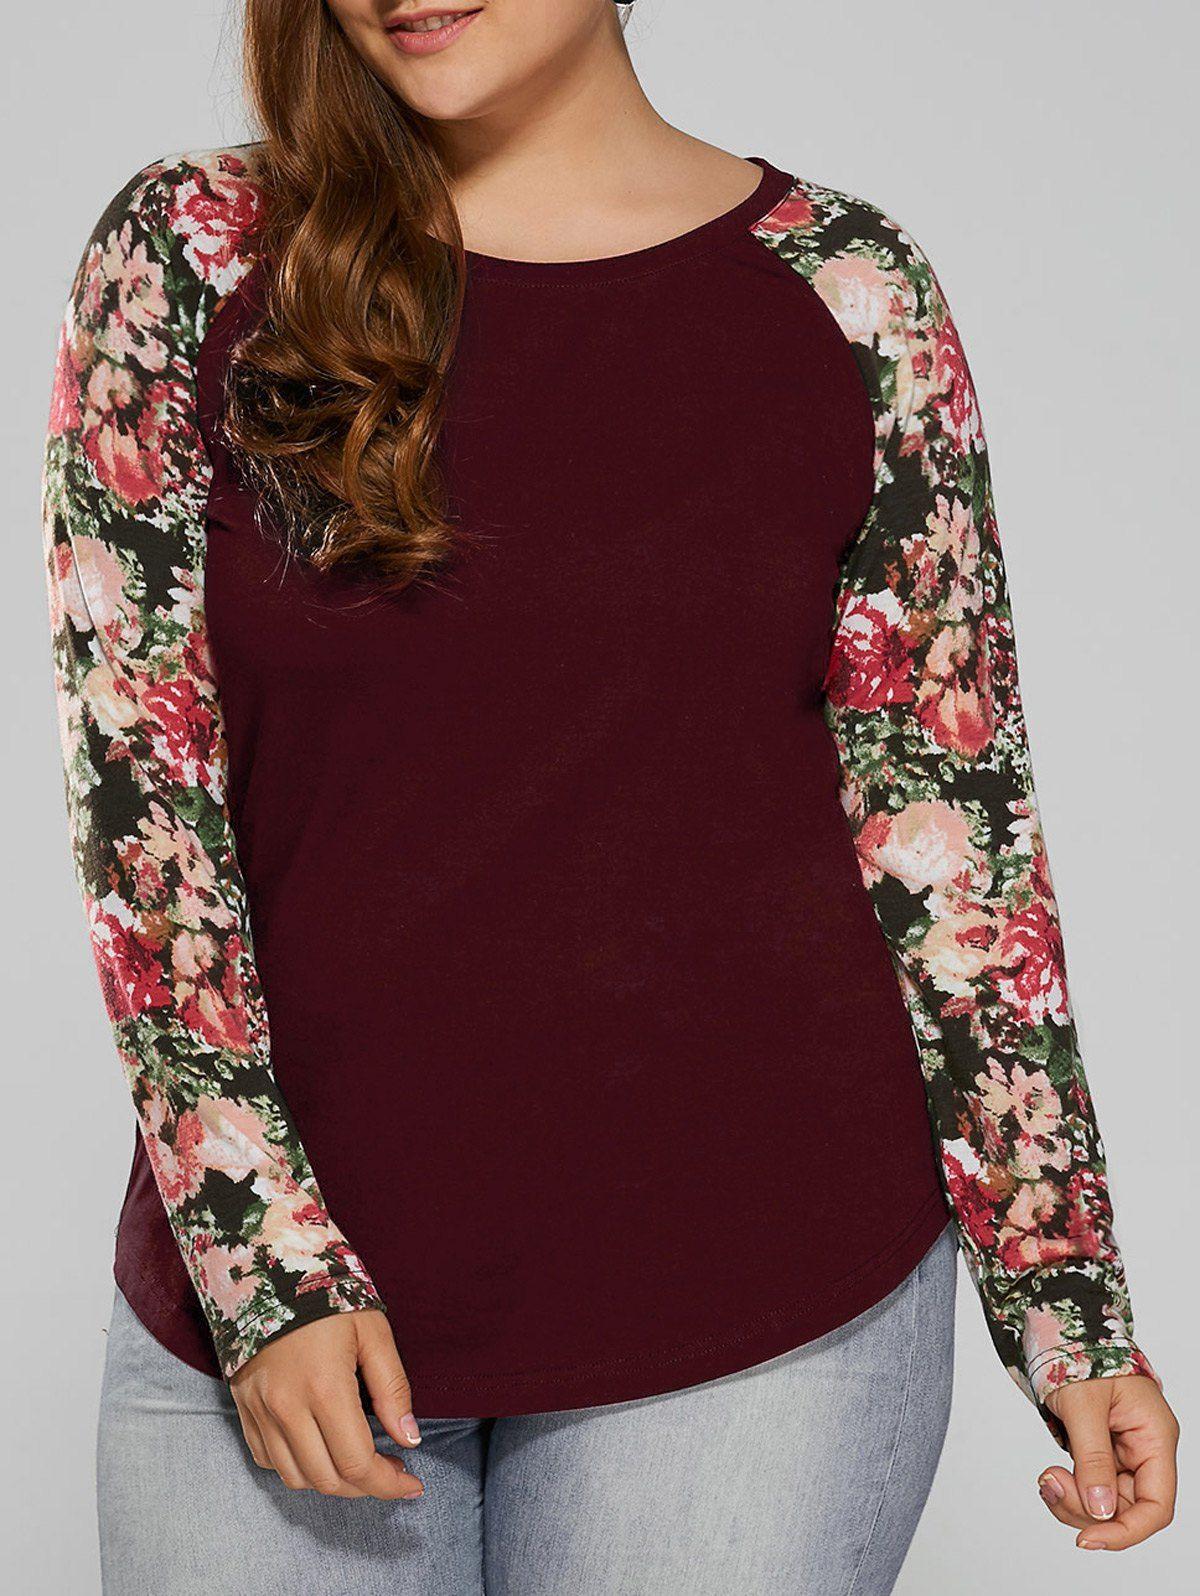 4ef2727e9 Plus Size Raglan Sleeve Floral T-Shirt | Fashion For Zoe & Shellie ...